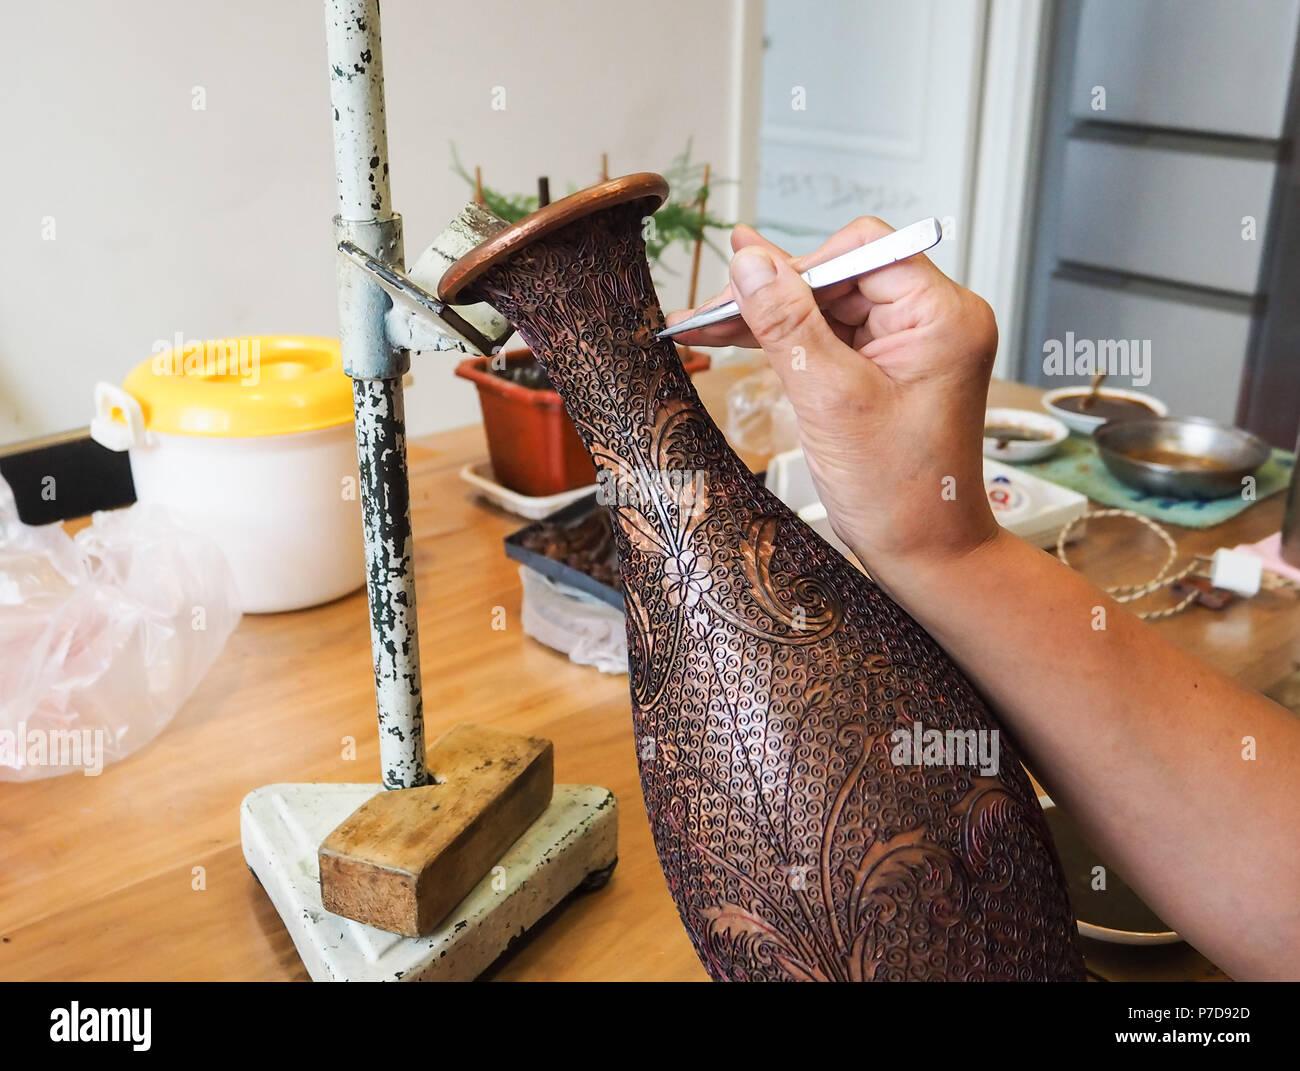 Gluing Stockfotos & Gluing Bilder - Alamy